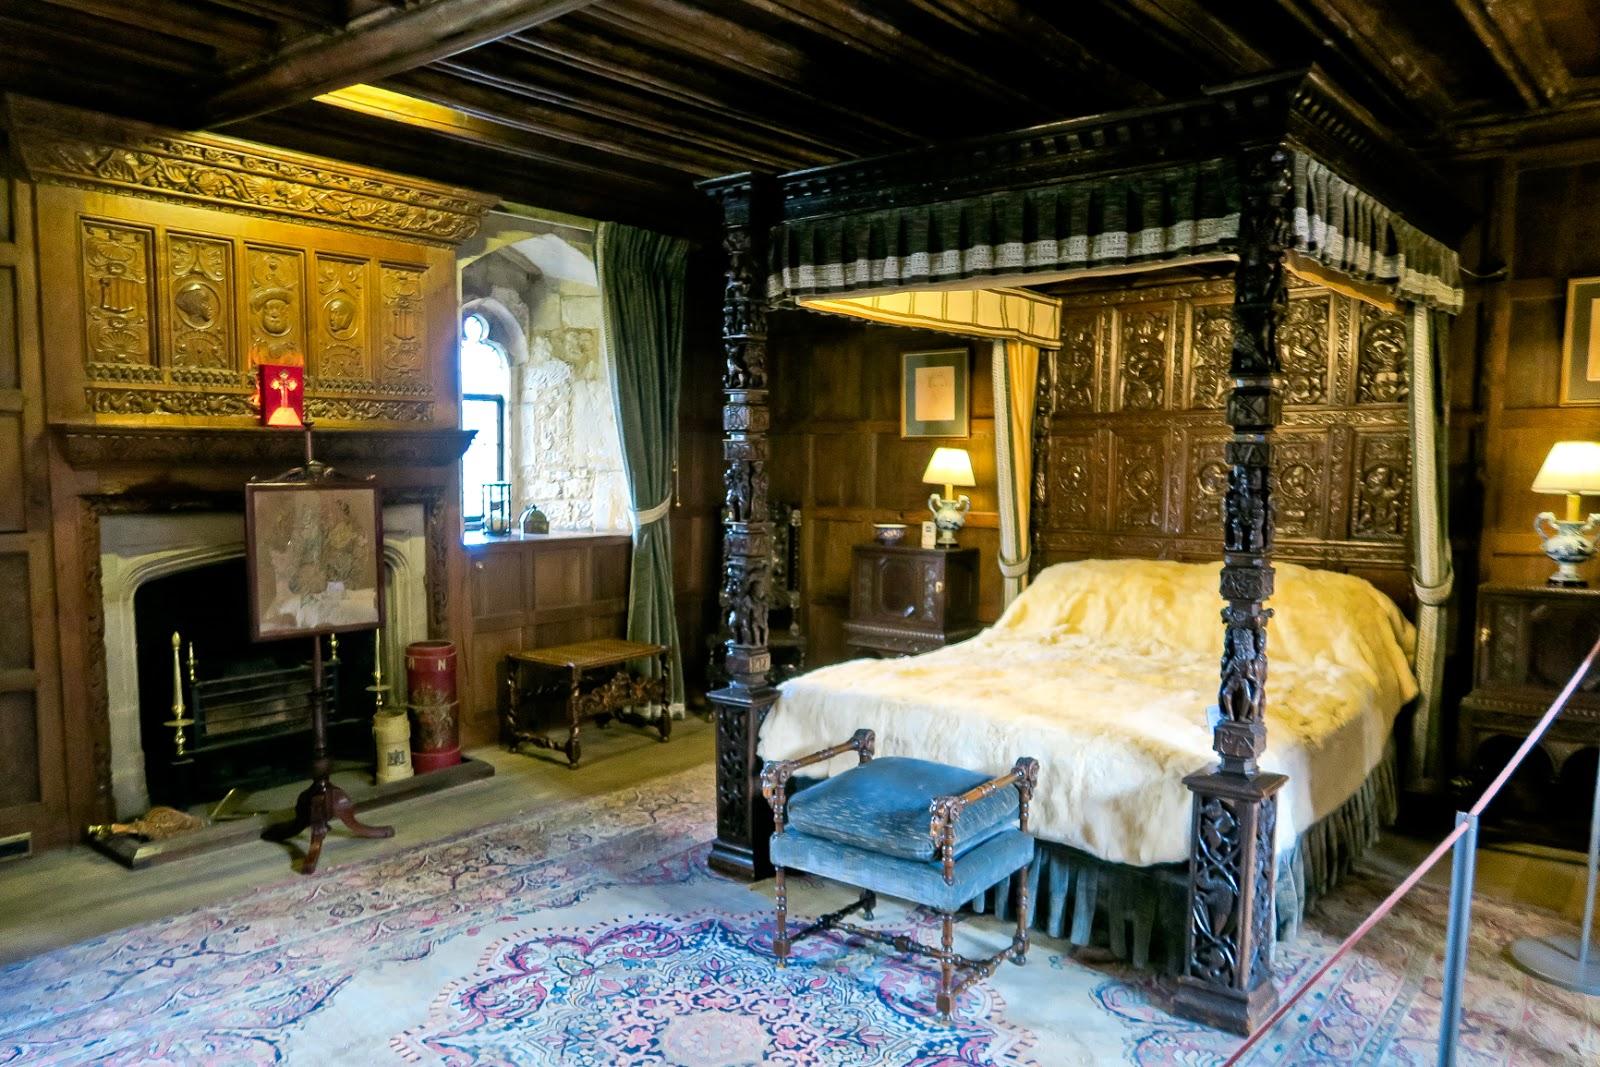 Spending the Night At Hever Castle, Hever Castle, Anne Boleyn's Childhood Home, Anne Boleyn, King Henry VIII, Jousting, English History, Royal Tudor Places